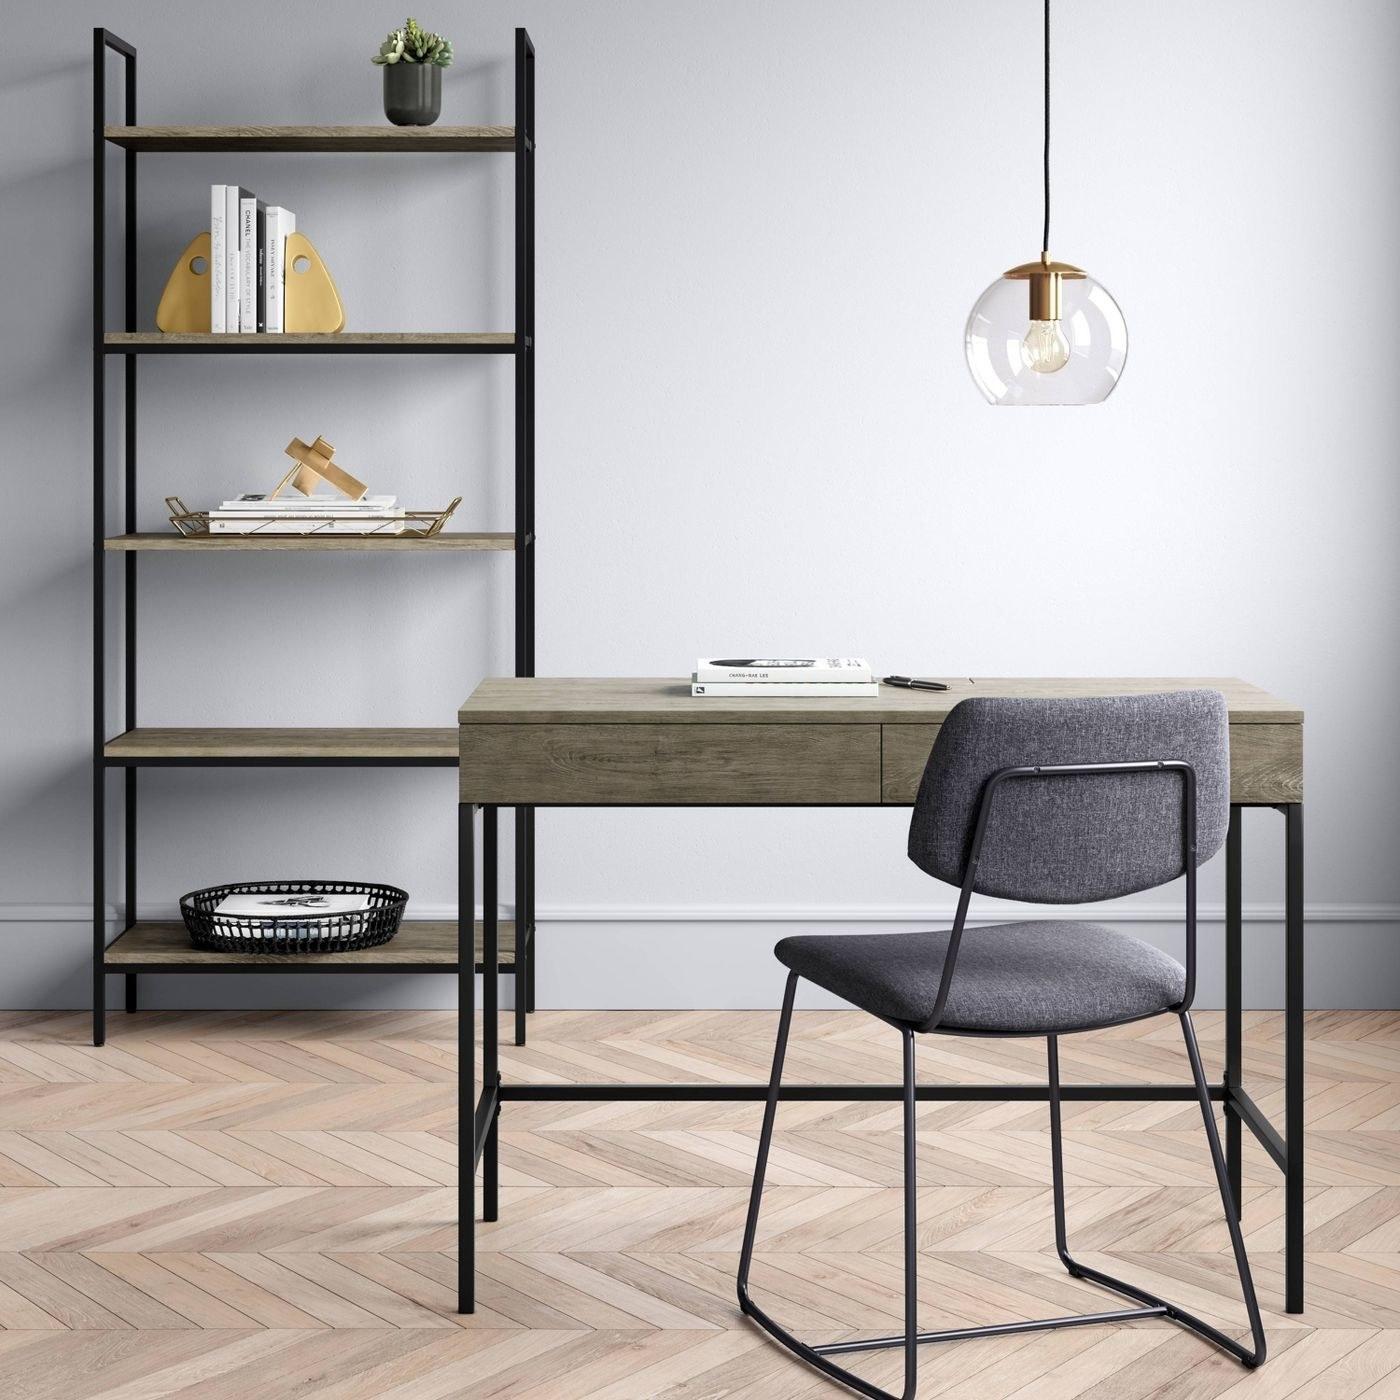 A grey desk in a home